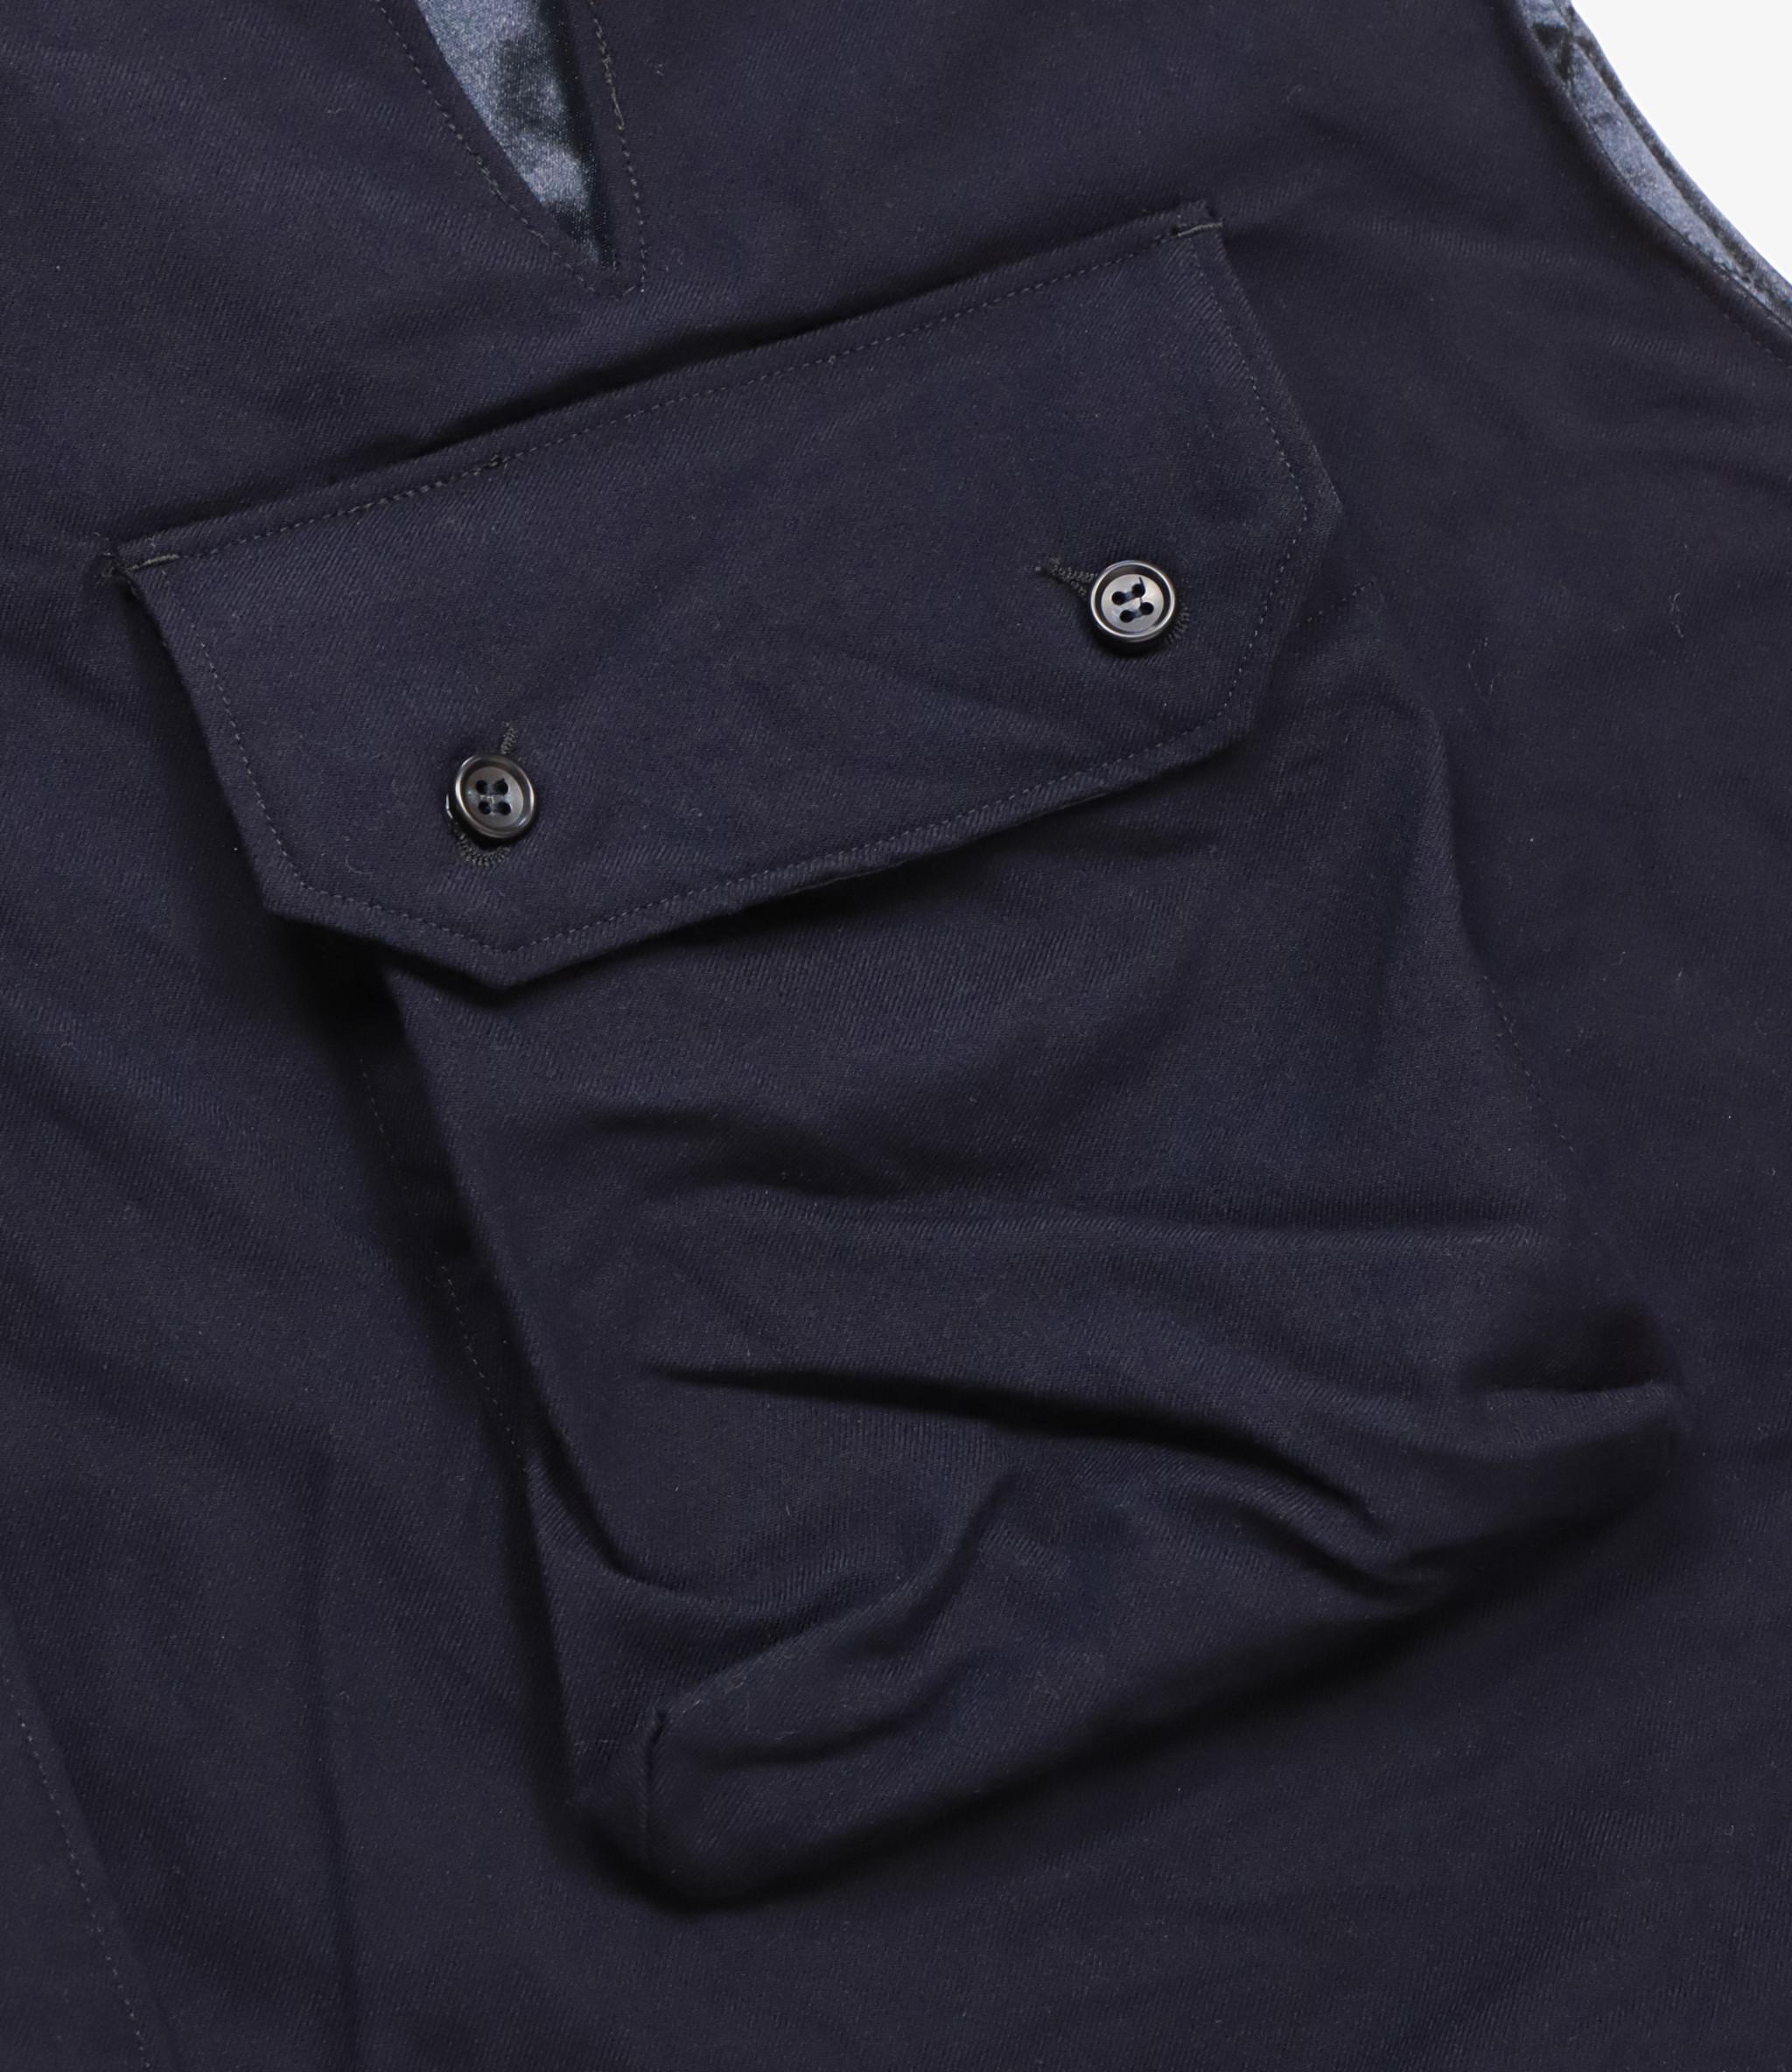 Engineered Garments Cover Vest - Dark Navy Wool Uniform Serge